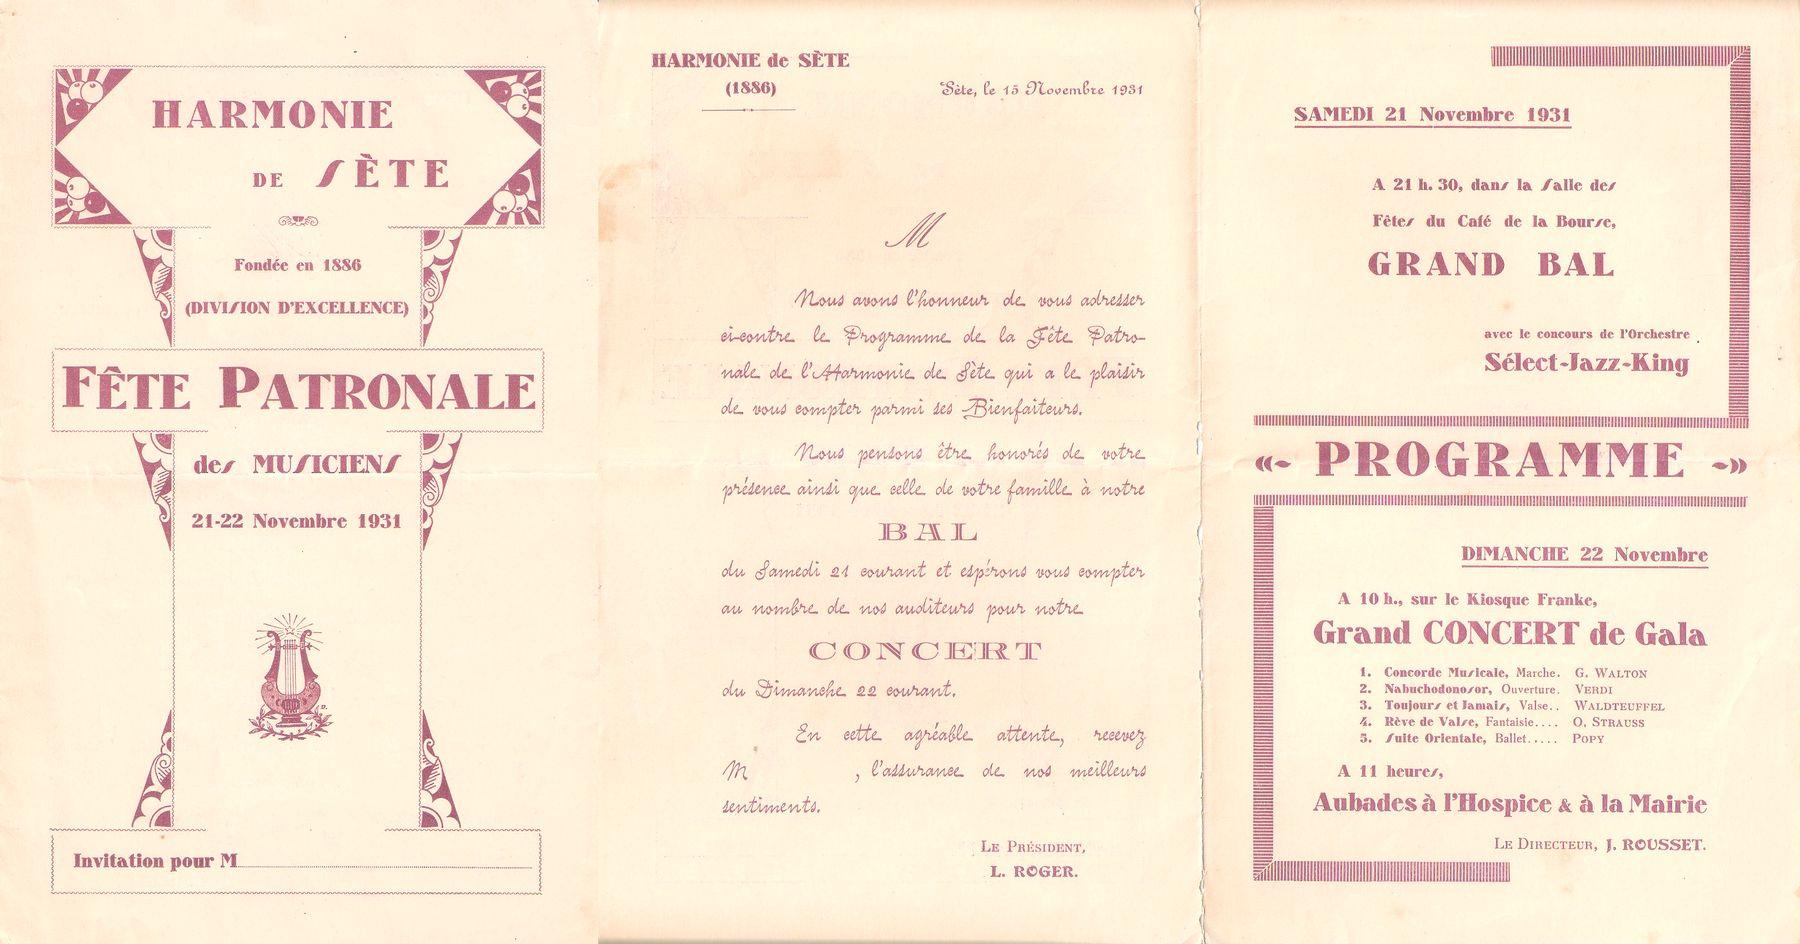 Programme de la fête patronale en 1931